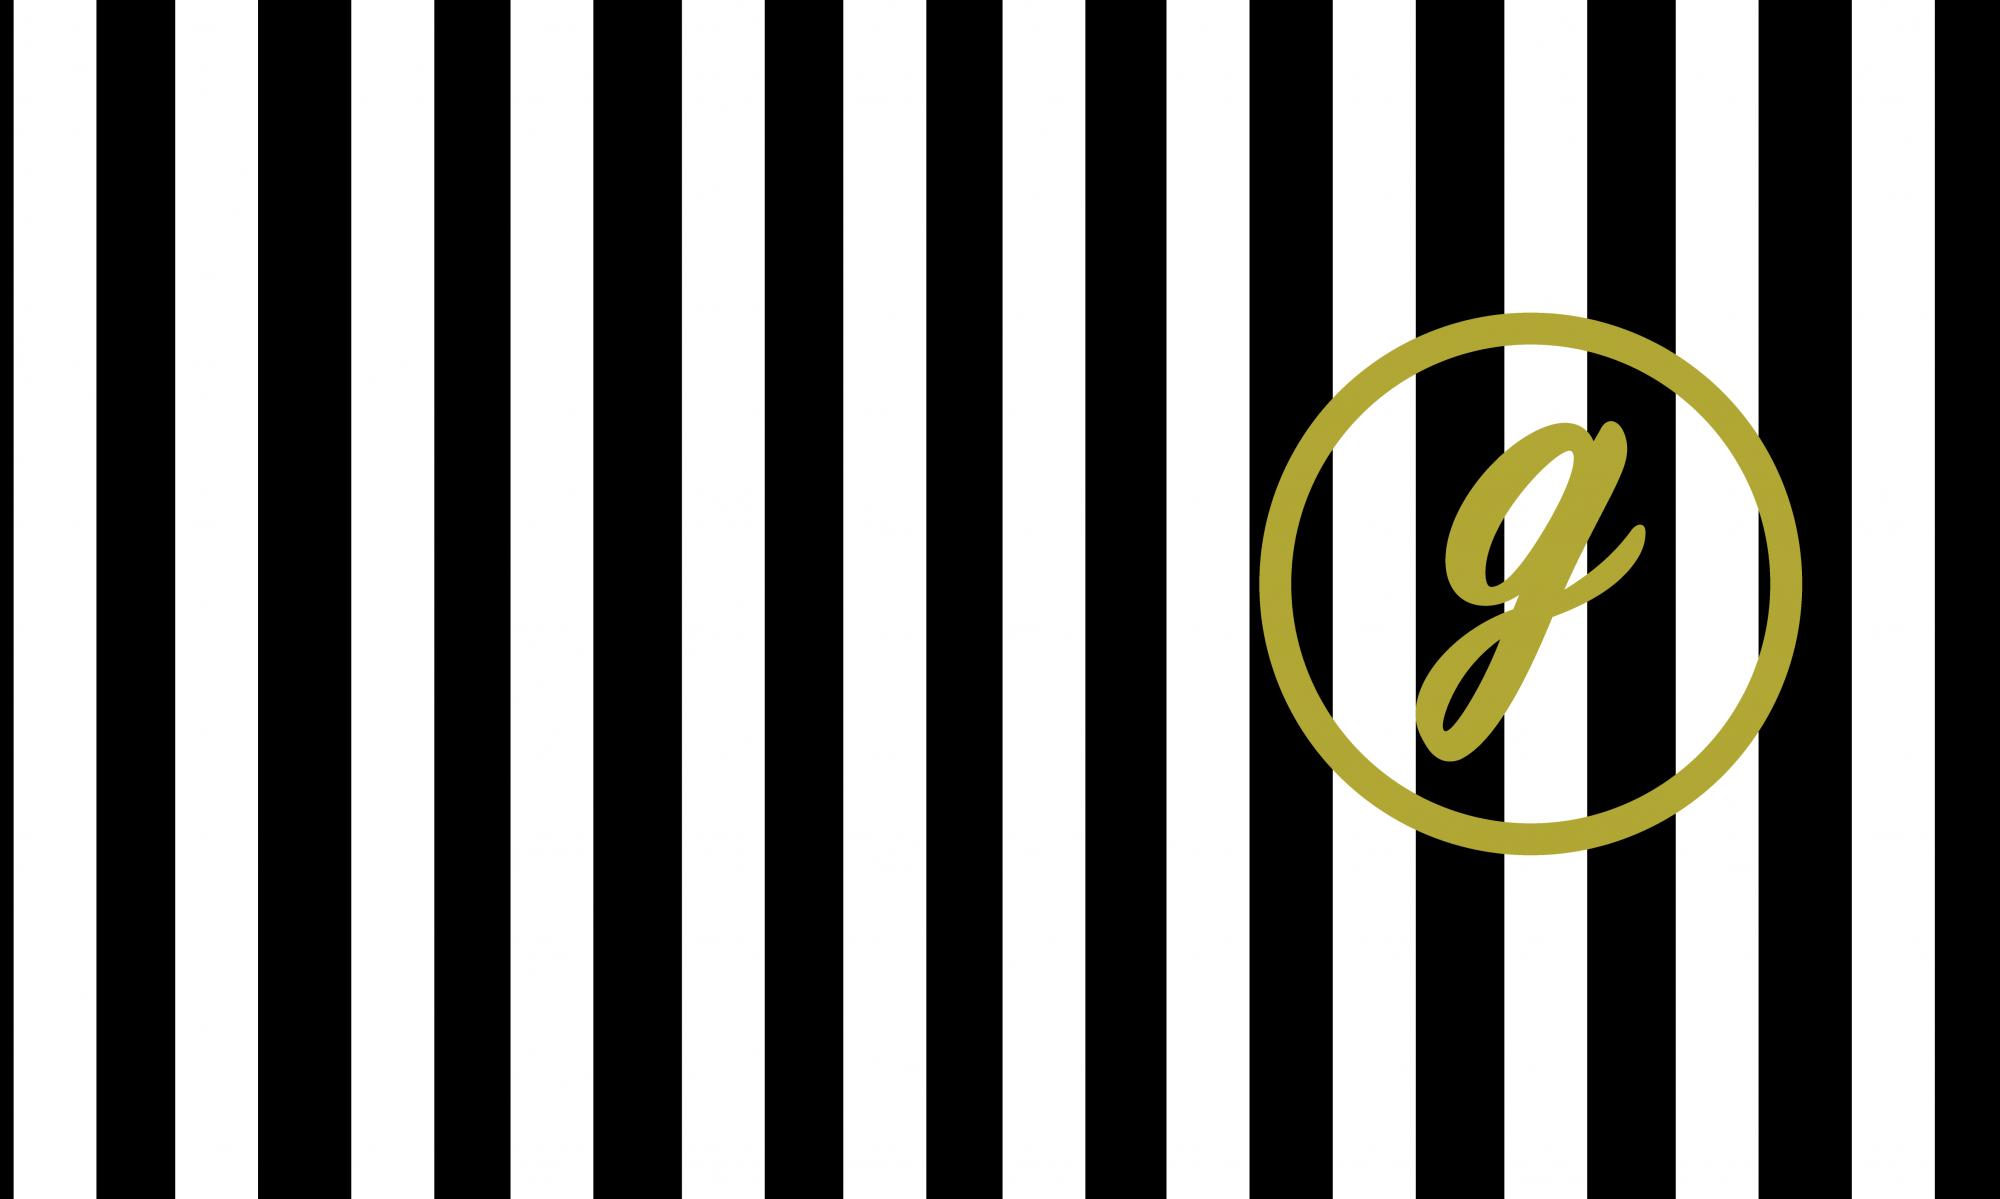 Gold Design & Comms